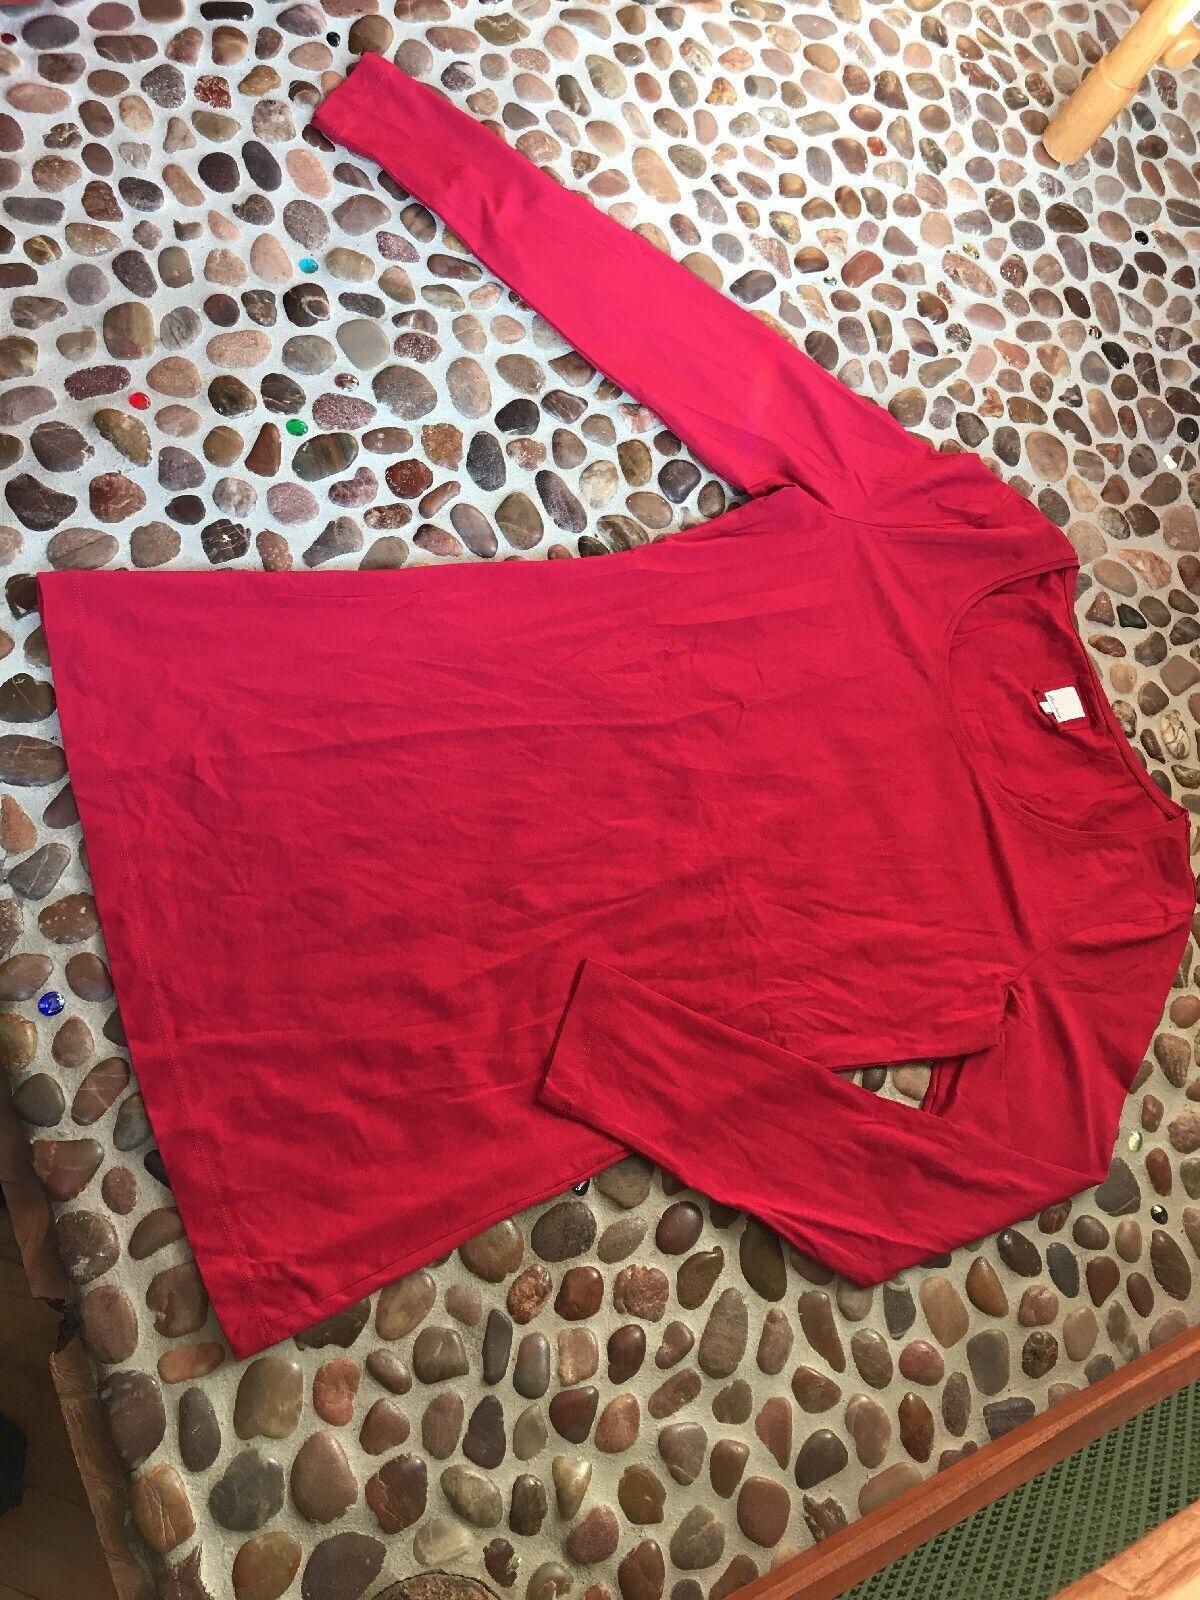 Deerberg L Langes Shirt Rot 80cm BW